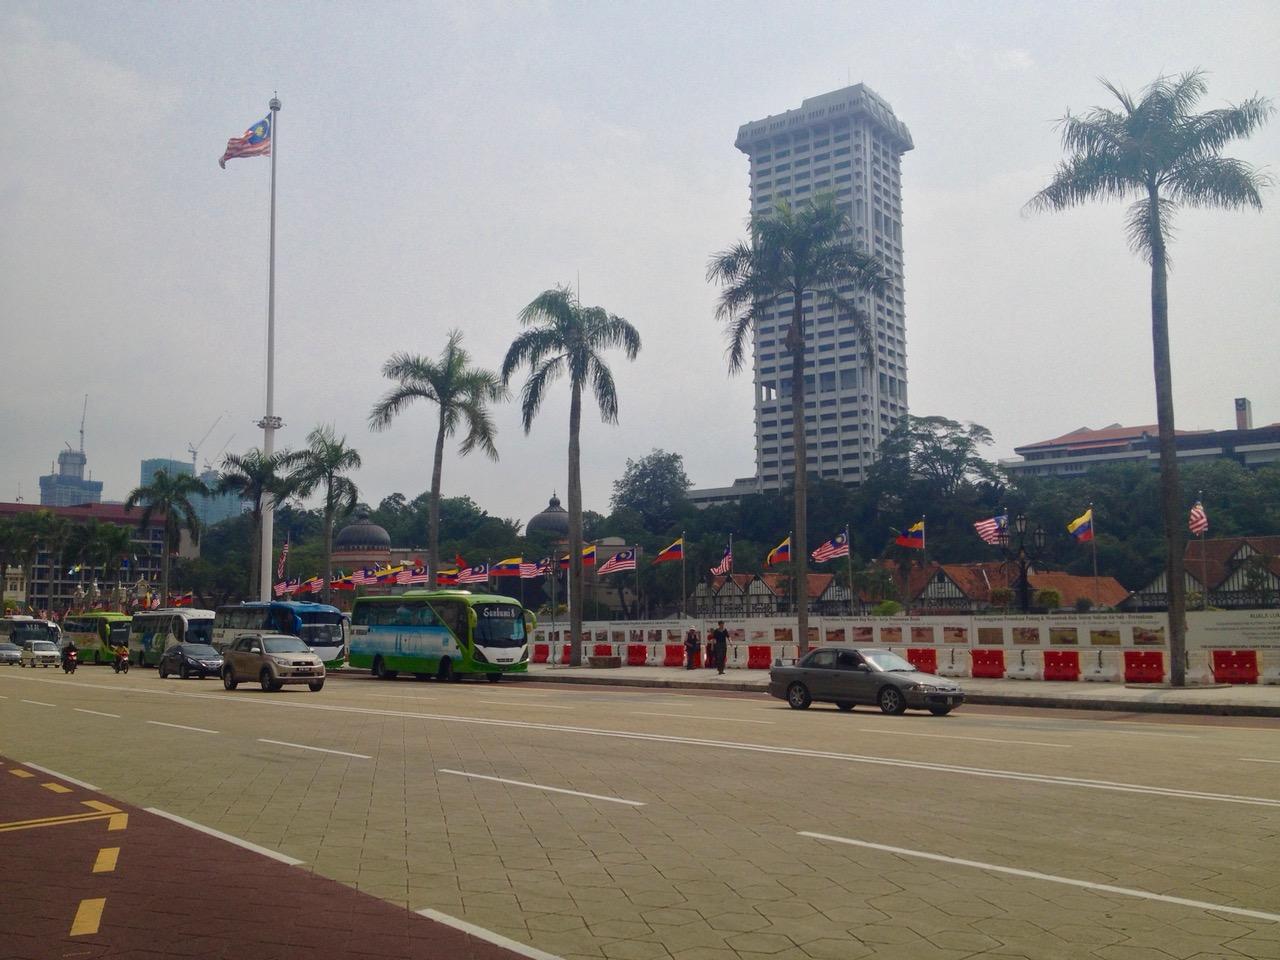 Kuala Lumpur Photos: Merdeka Square